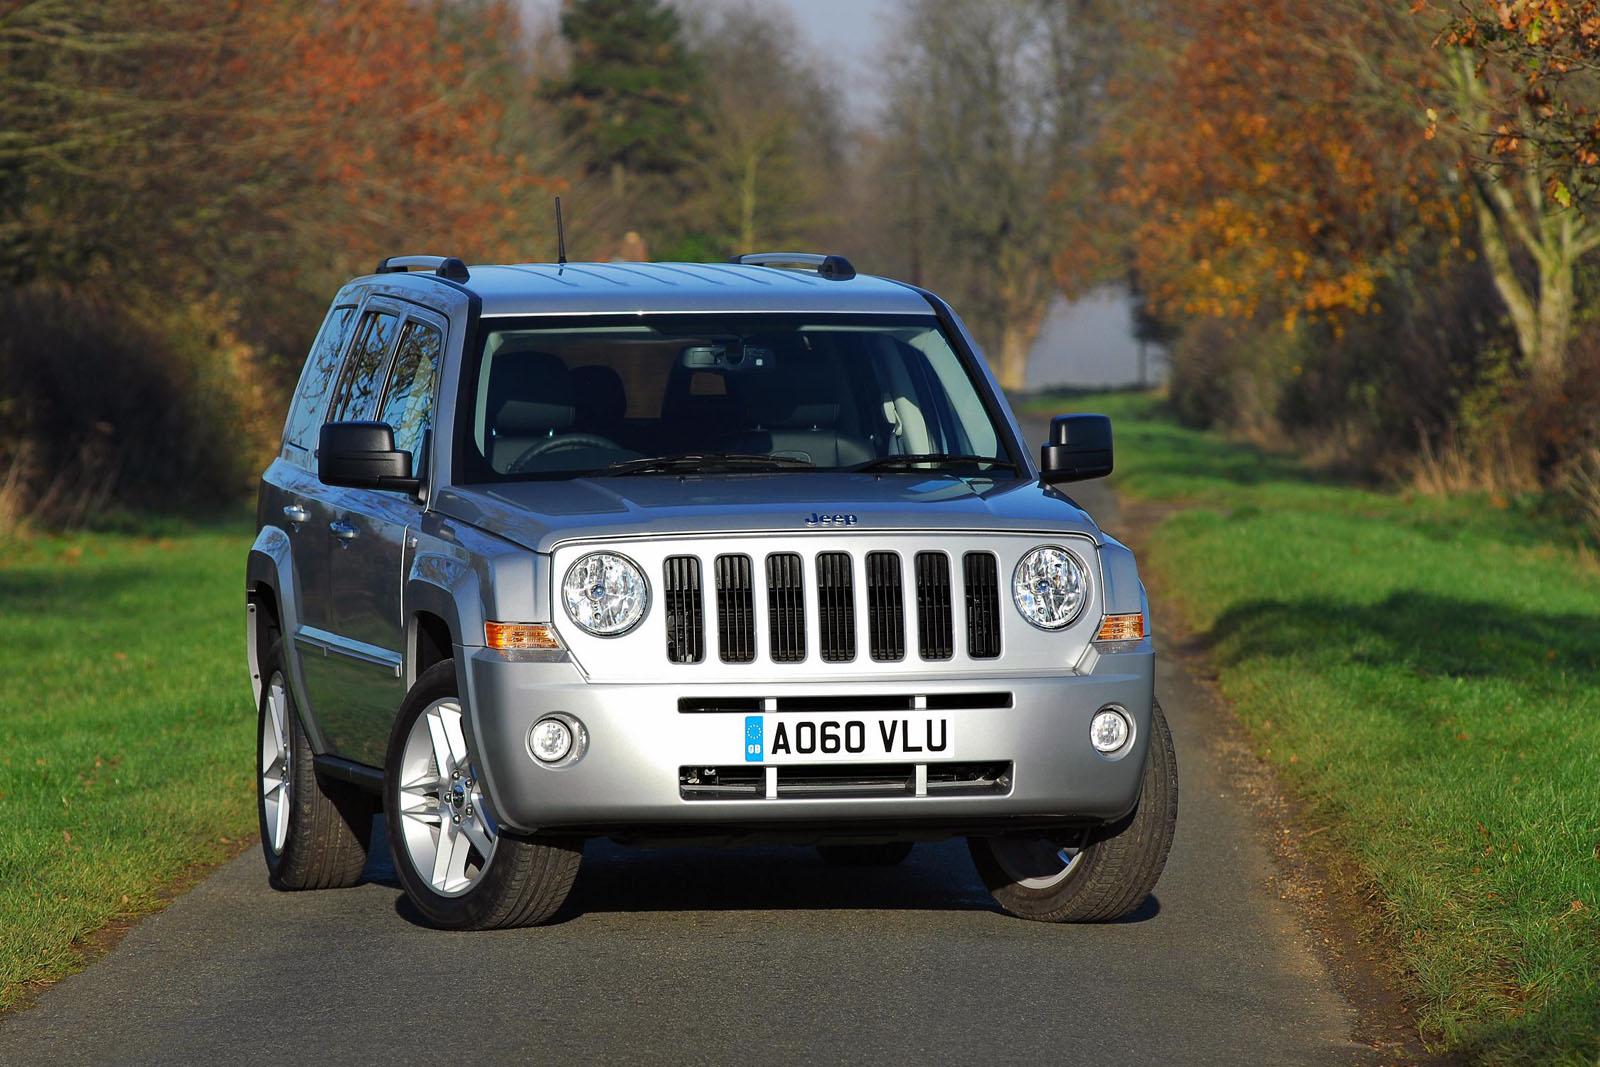 jeep patriot 2 2 crd specification autos car. Black Bedroom Furniture Sets. Home Design Ideas